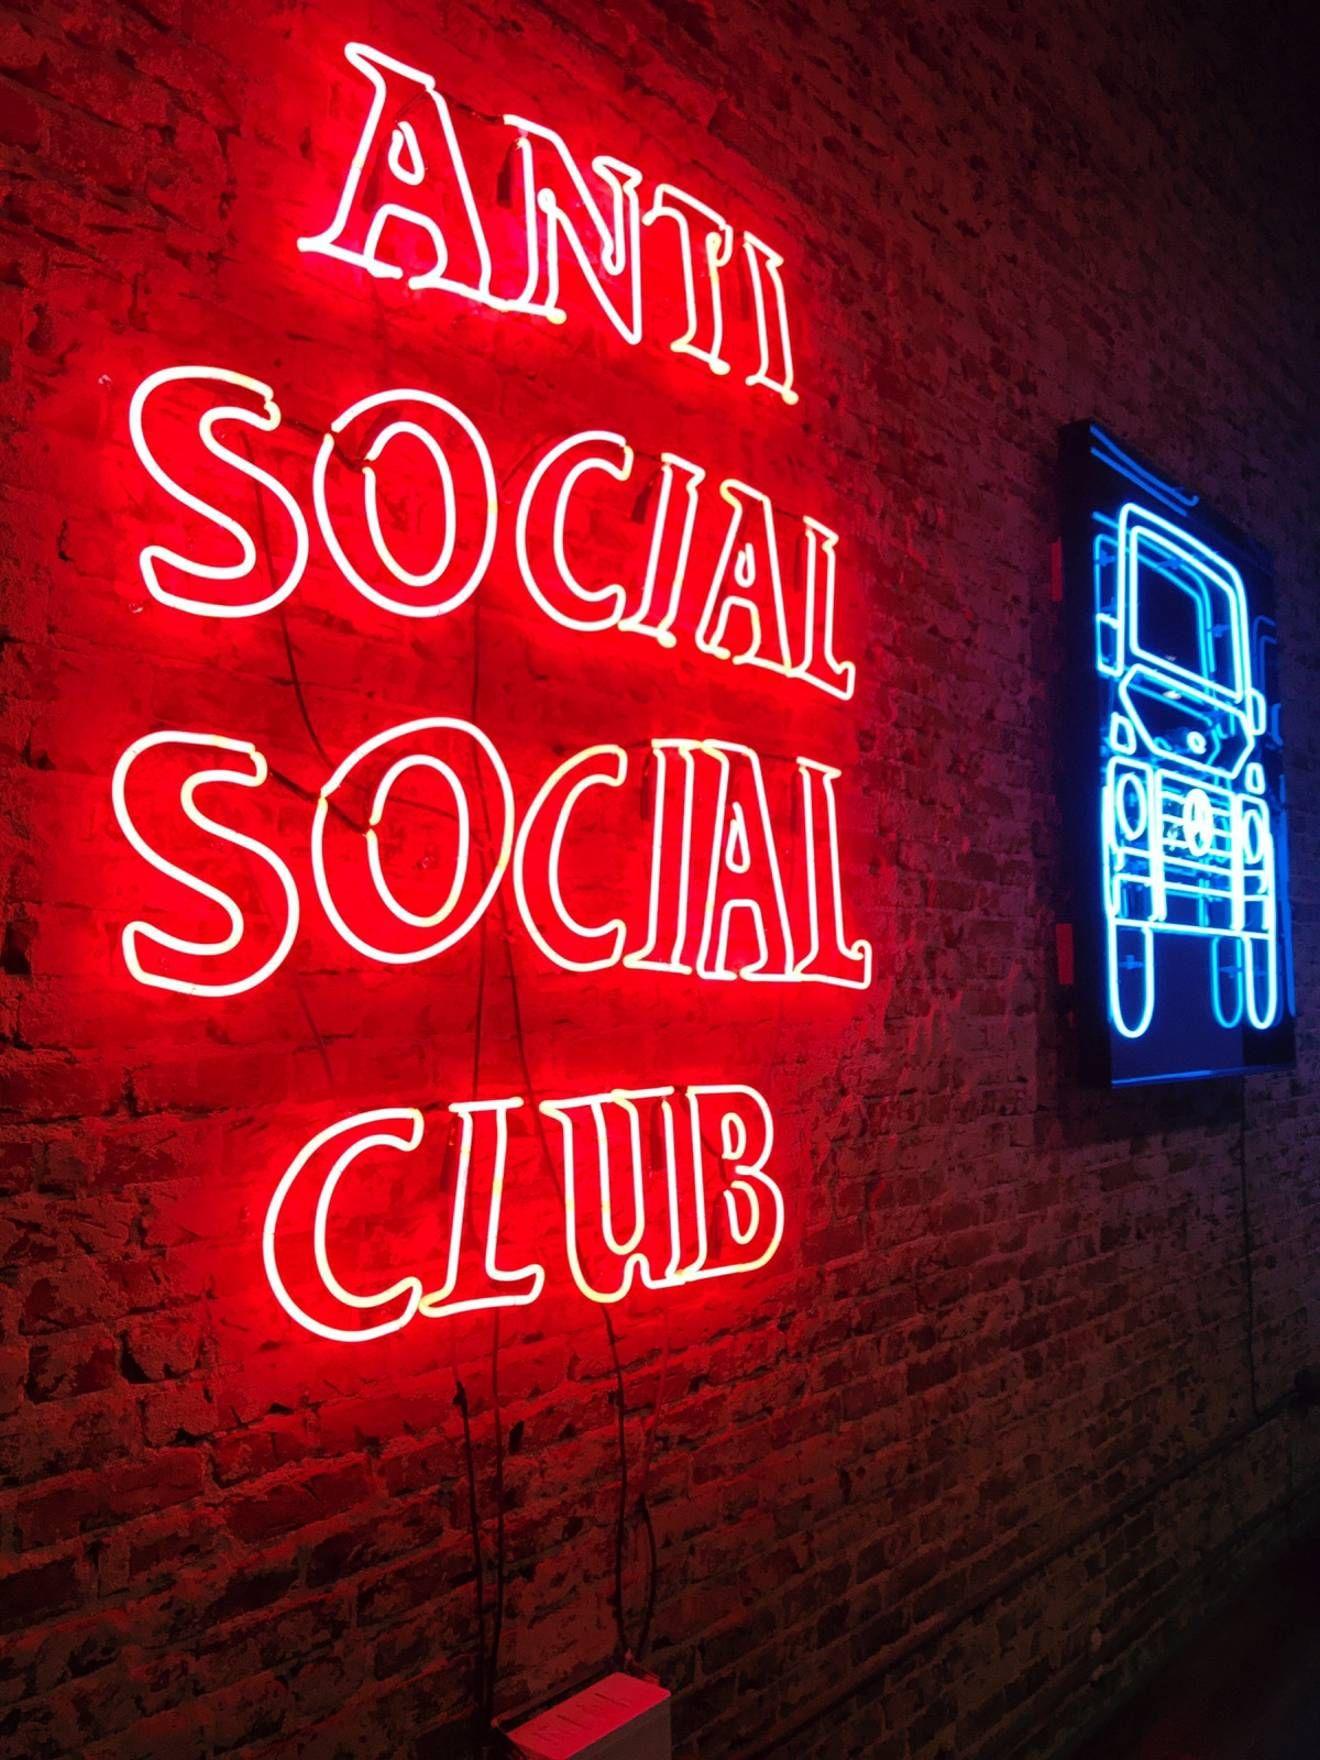 Rsvp Gallery Assc X Rsvp Gallery Size Us M Eu 48 50 2 4 Anti Social Social Club Rsvp Social Club